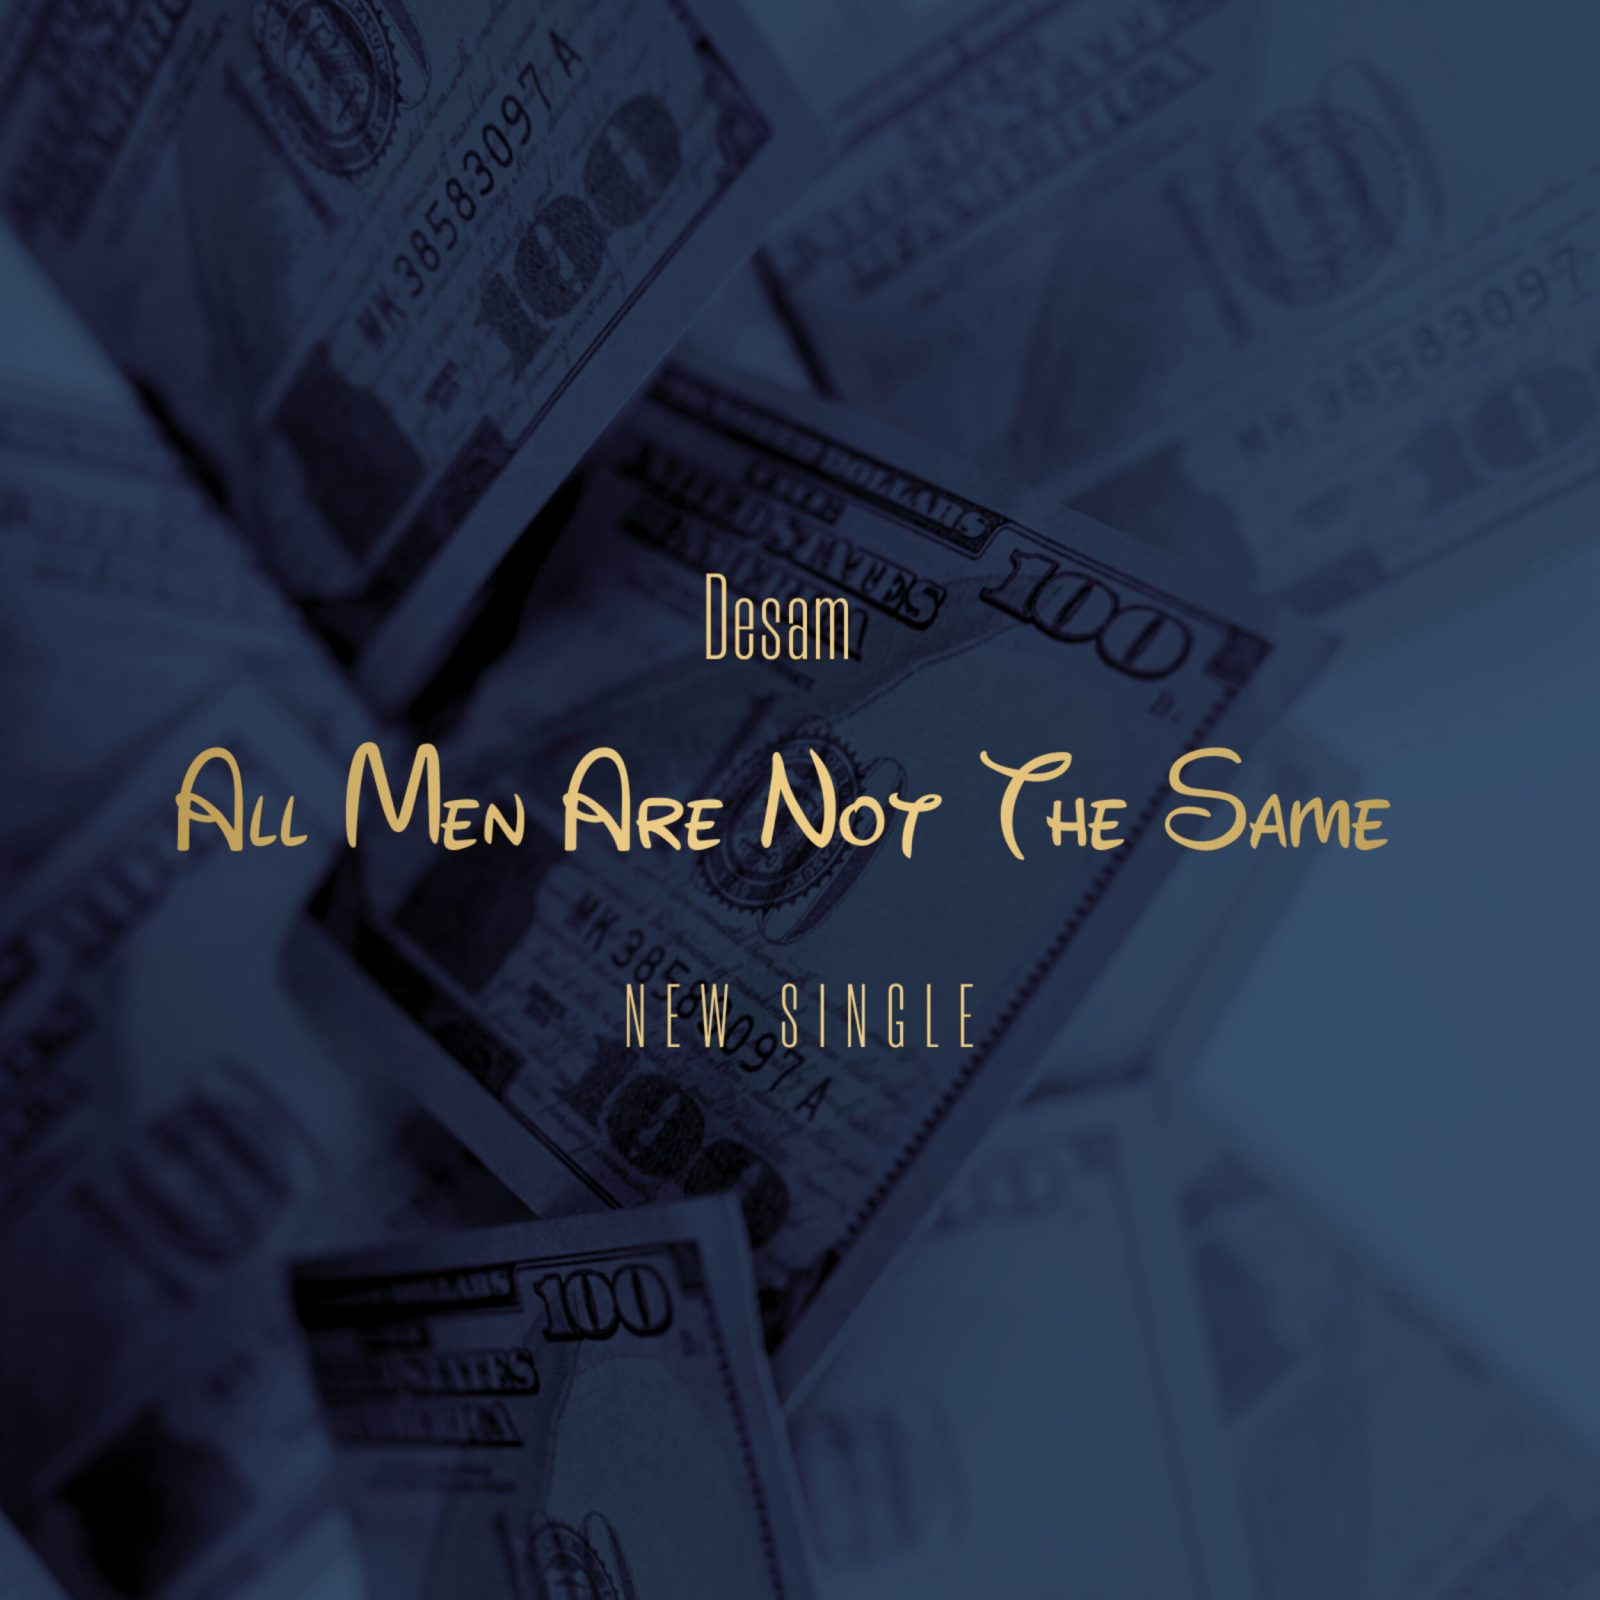 Desam - All men are not the same